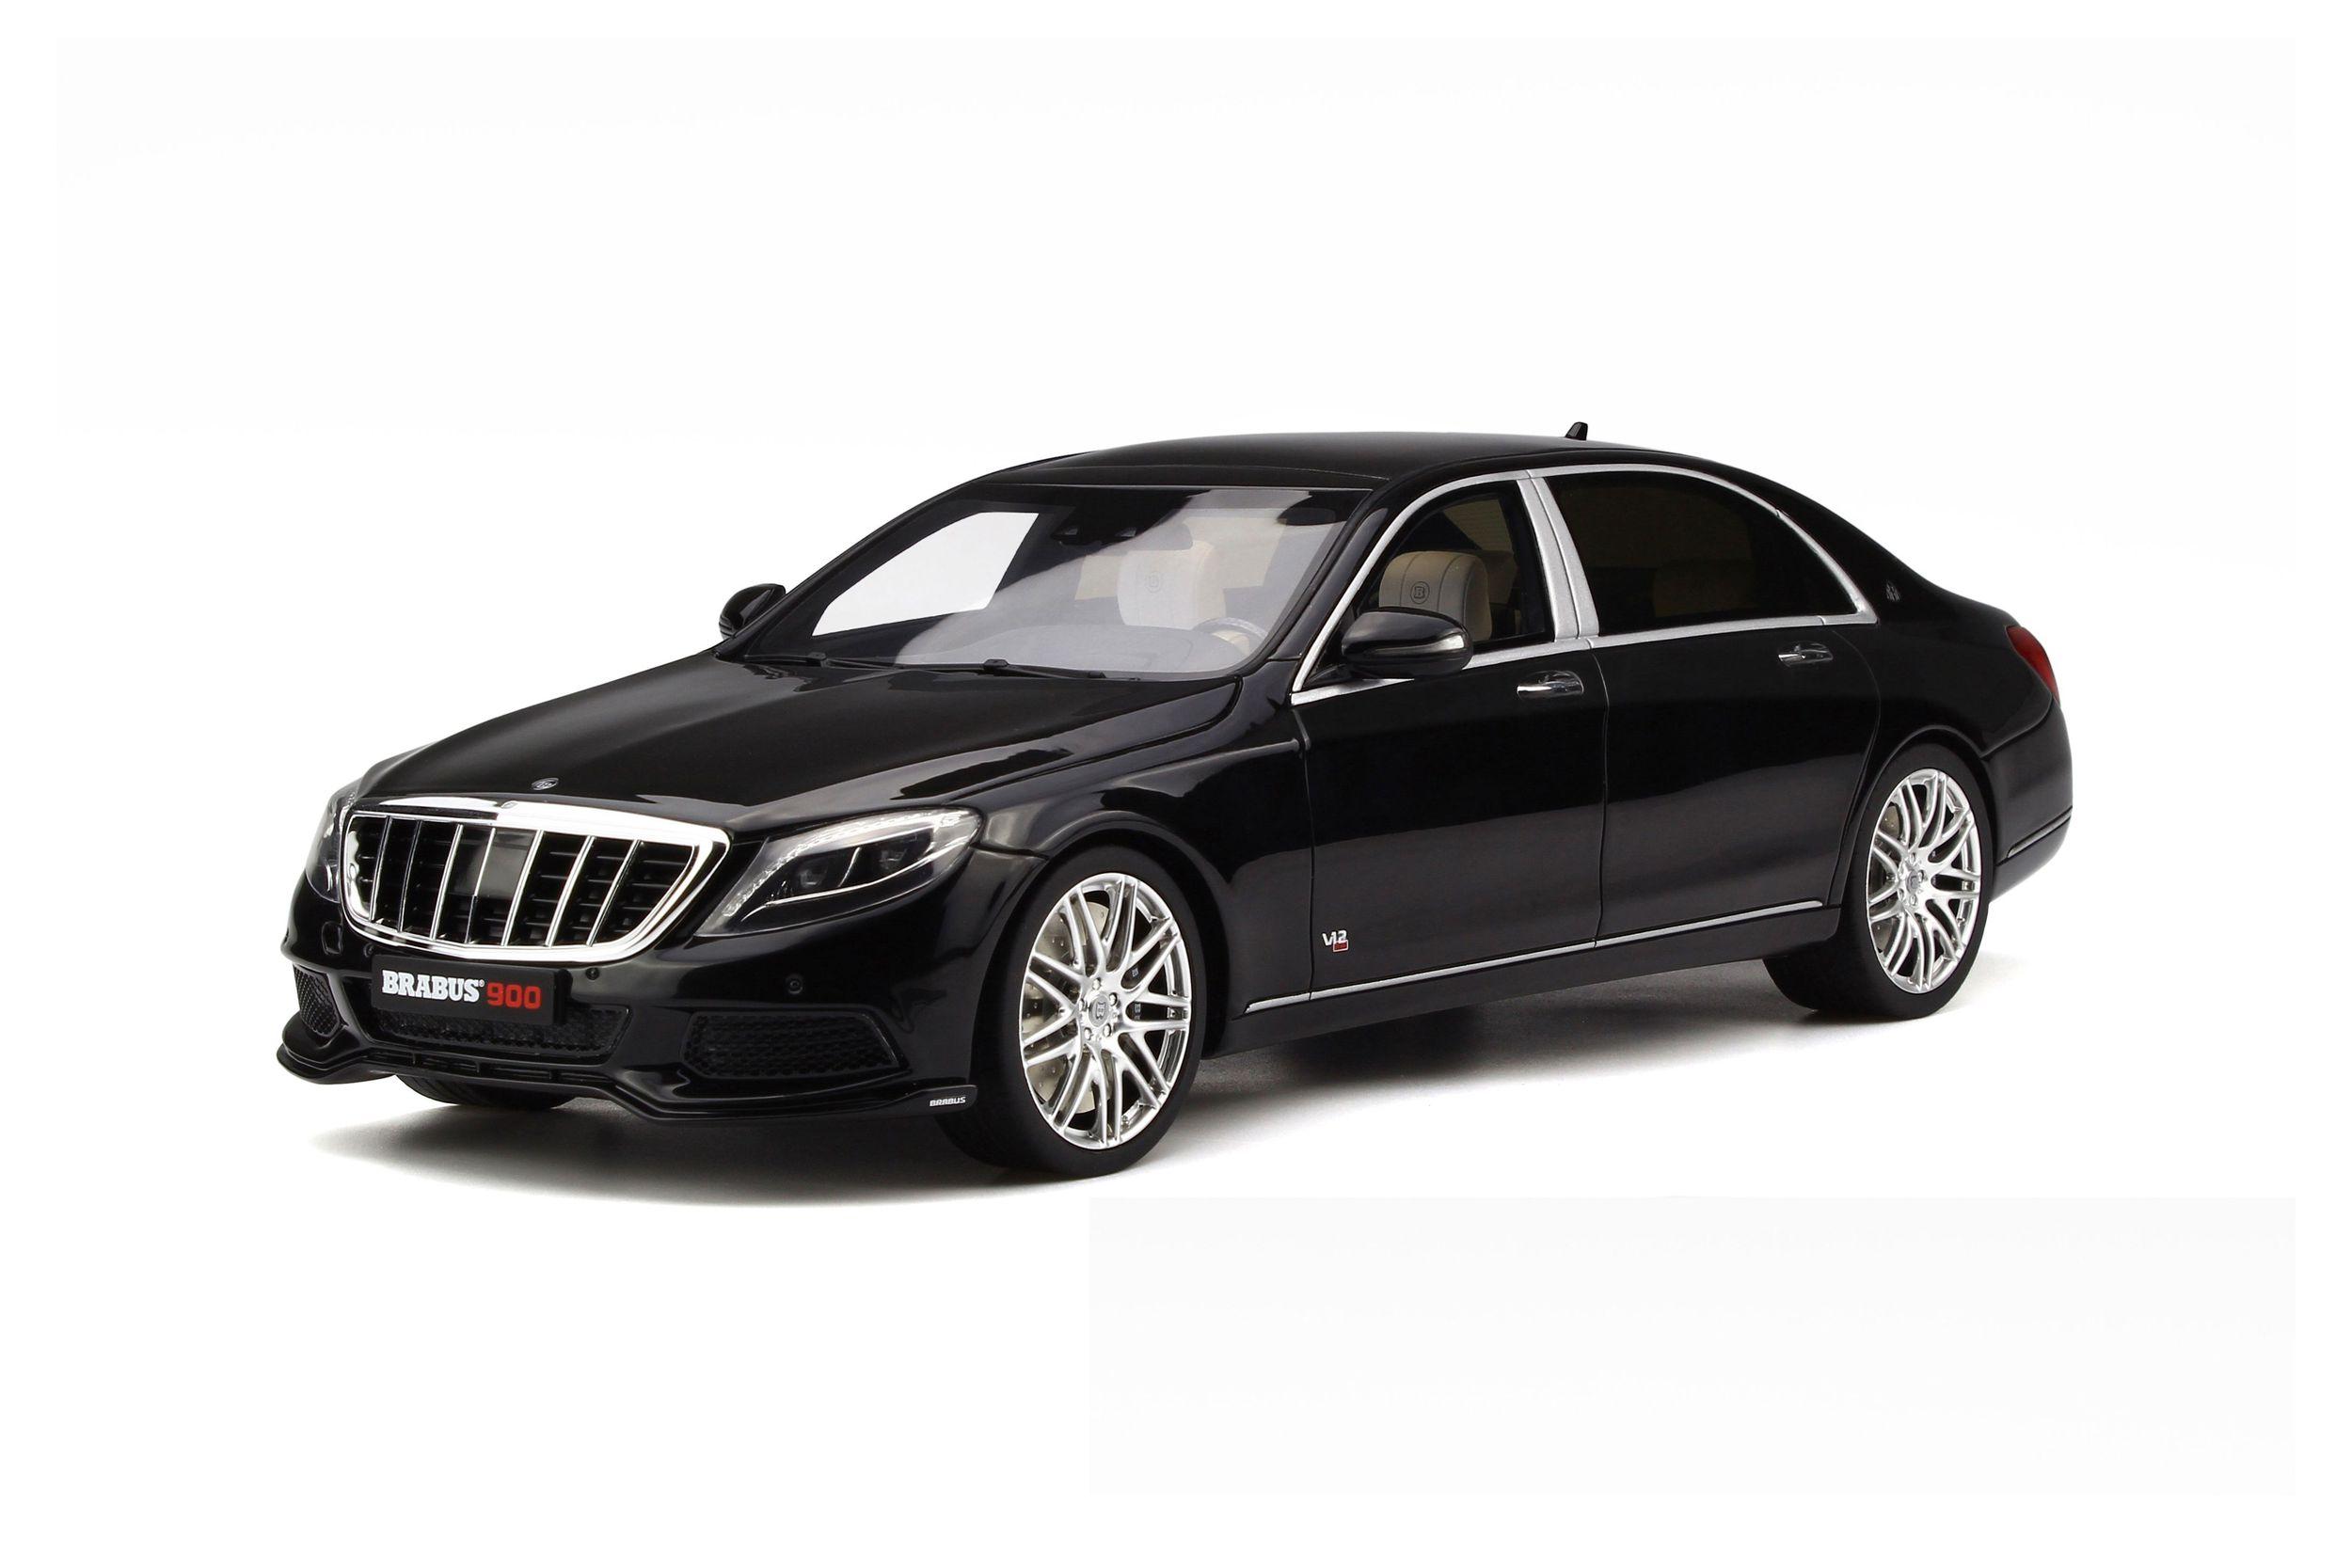 brabus-maybach 900 - model car collection | gt spirit